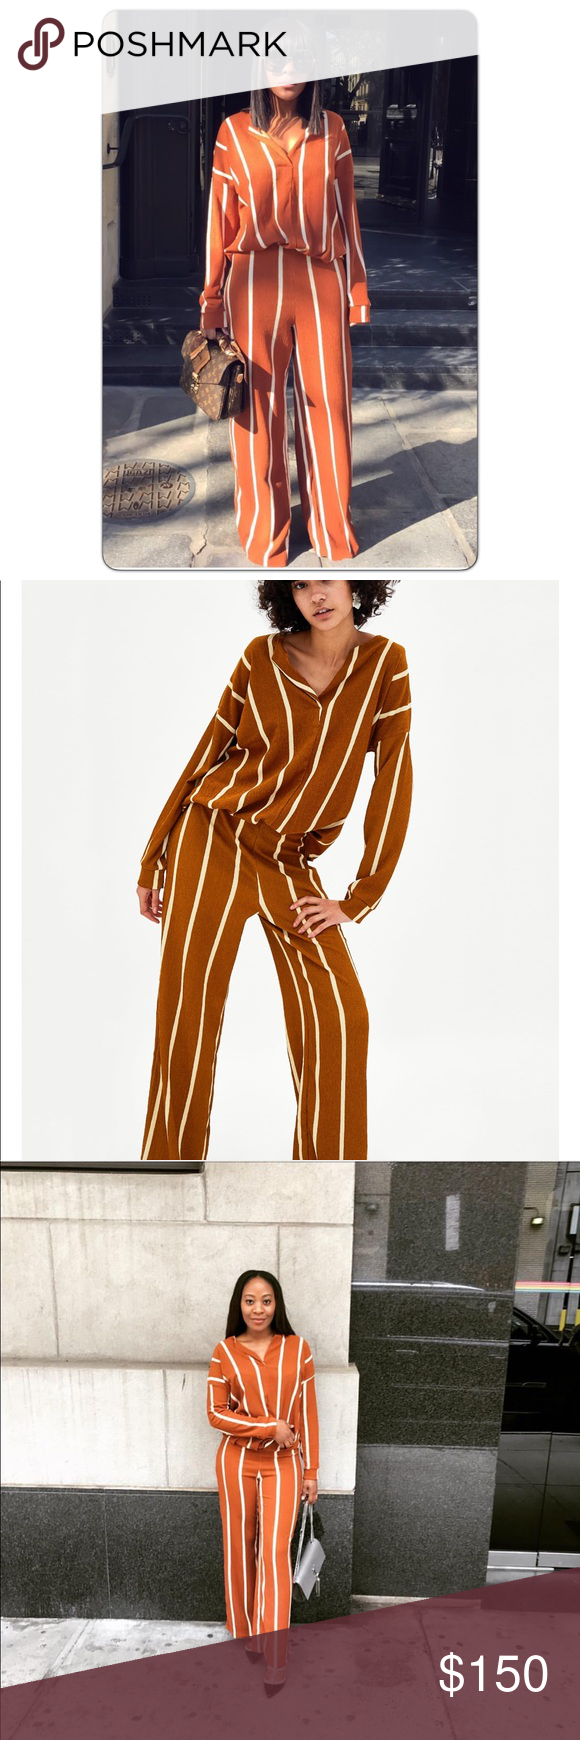 2c195fe5 GORGEOUS NWT ZARA Stripe 2 Piece Set Blouse & Pant New with tags ...